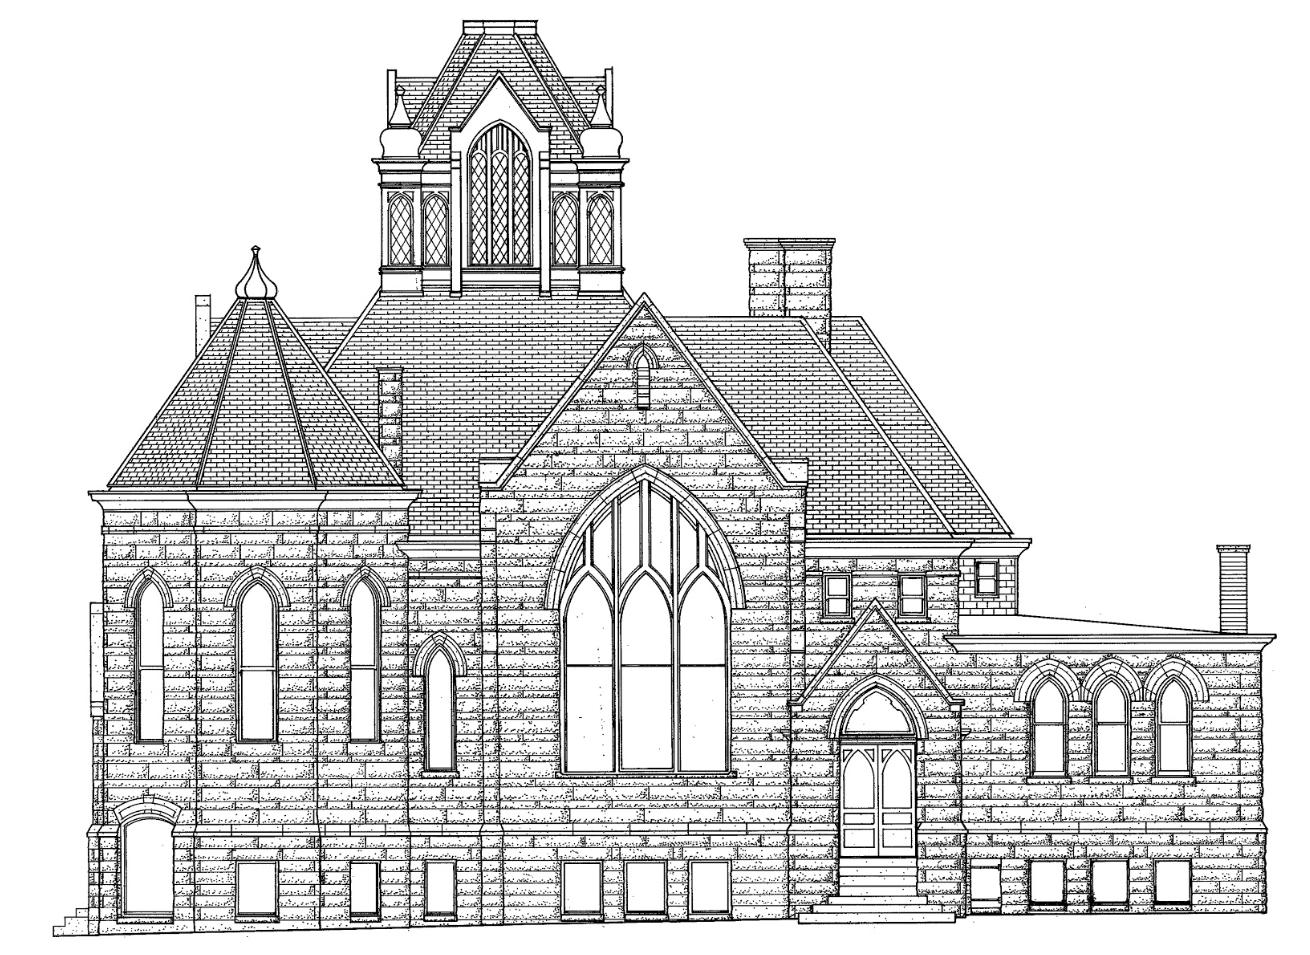 LOCATION: HALE MEMORIAL CHURCH 401 W HIGH ST PEORIA IL 61606